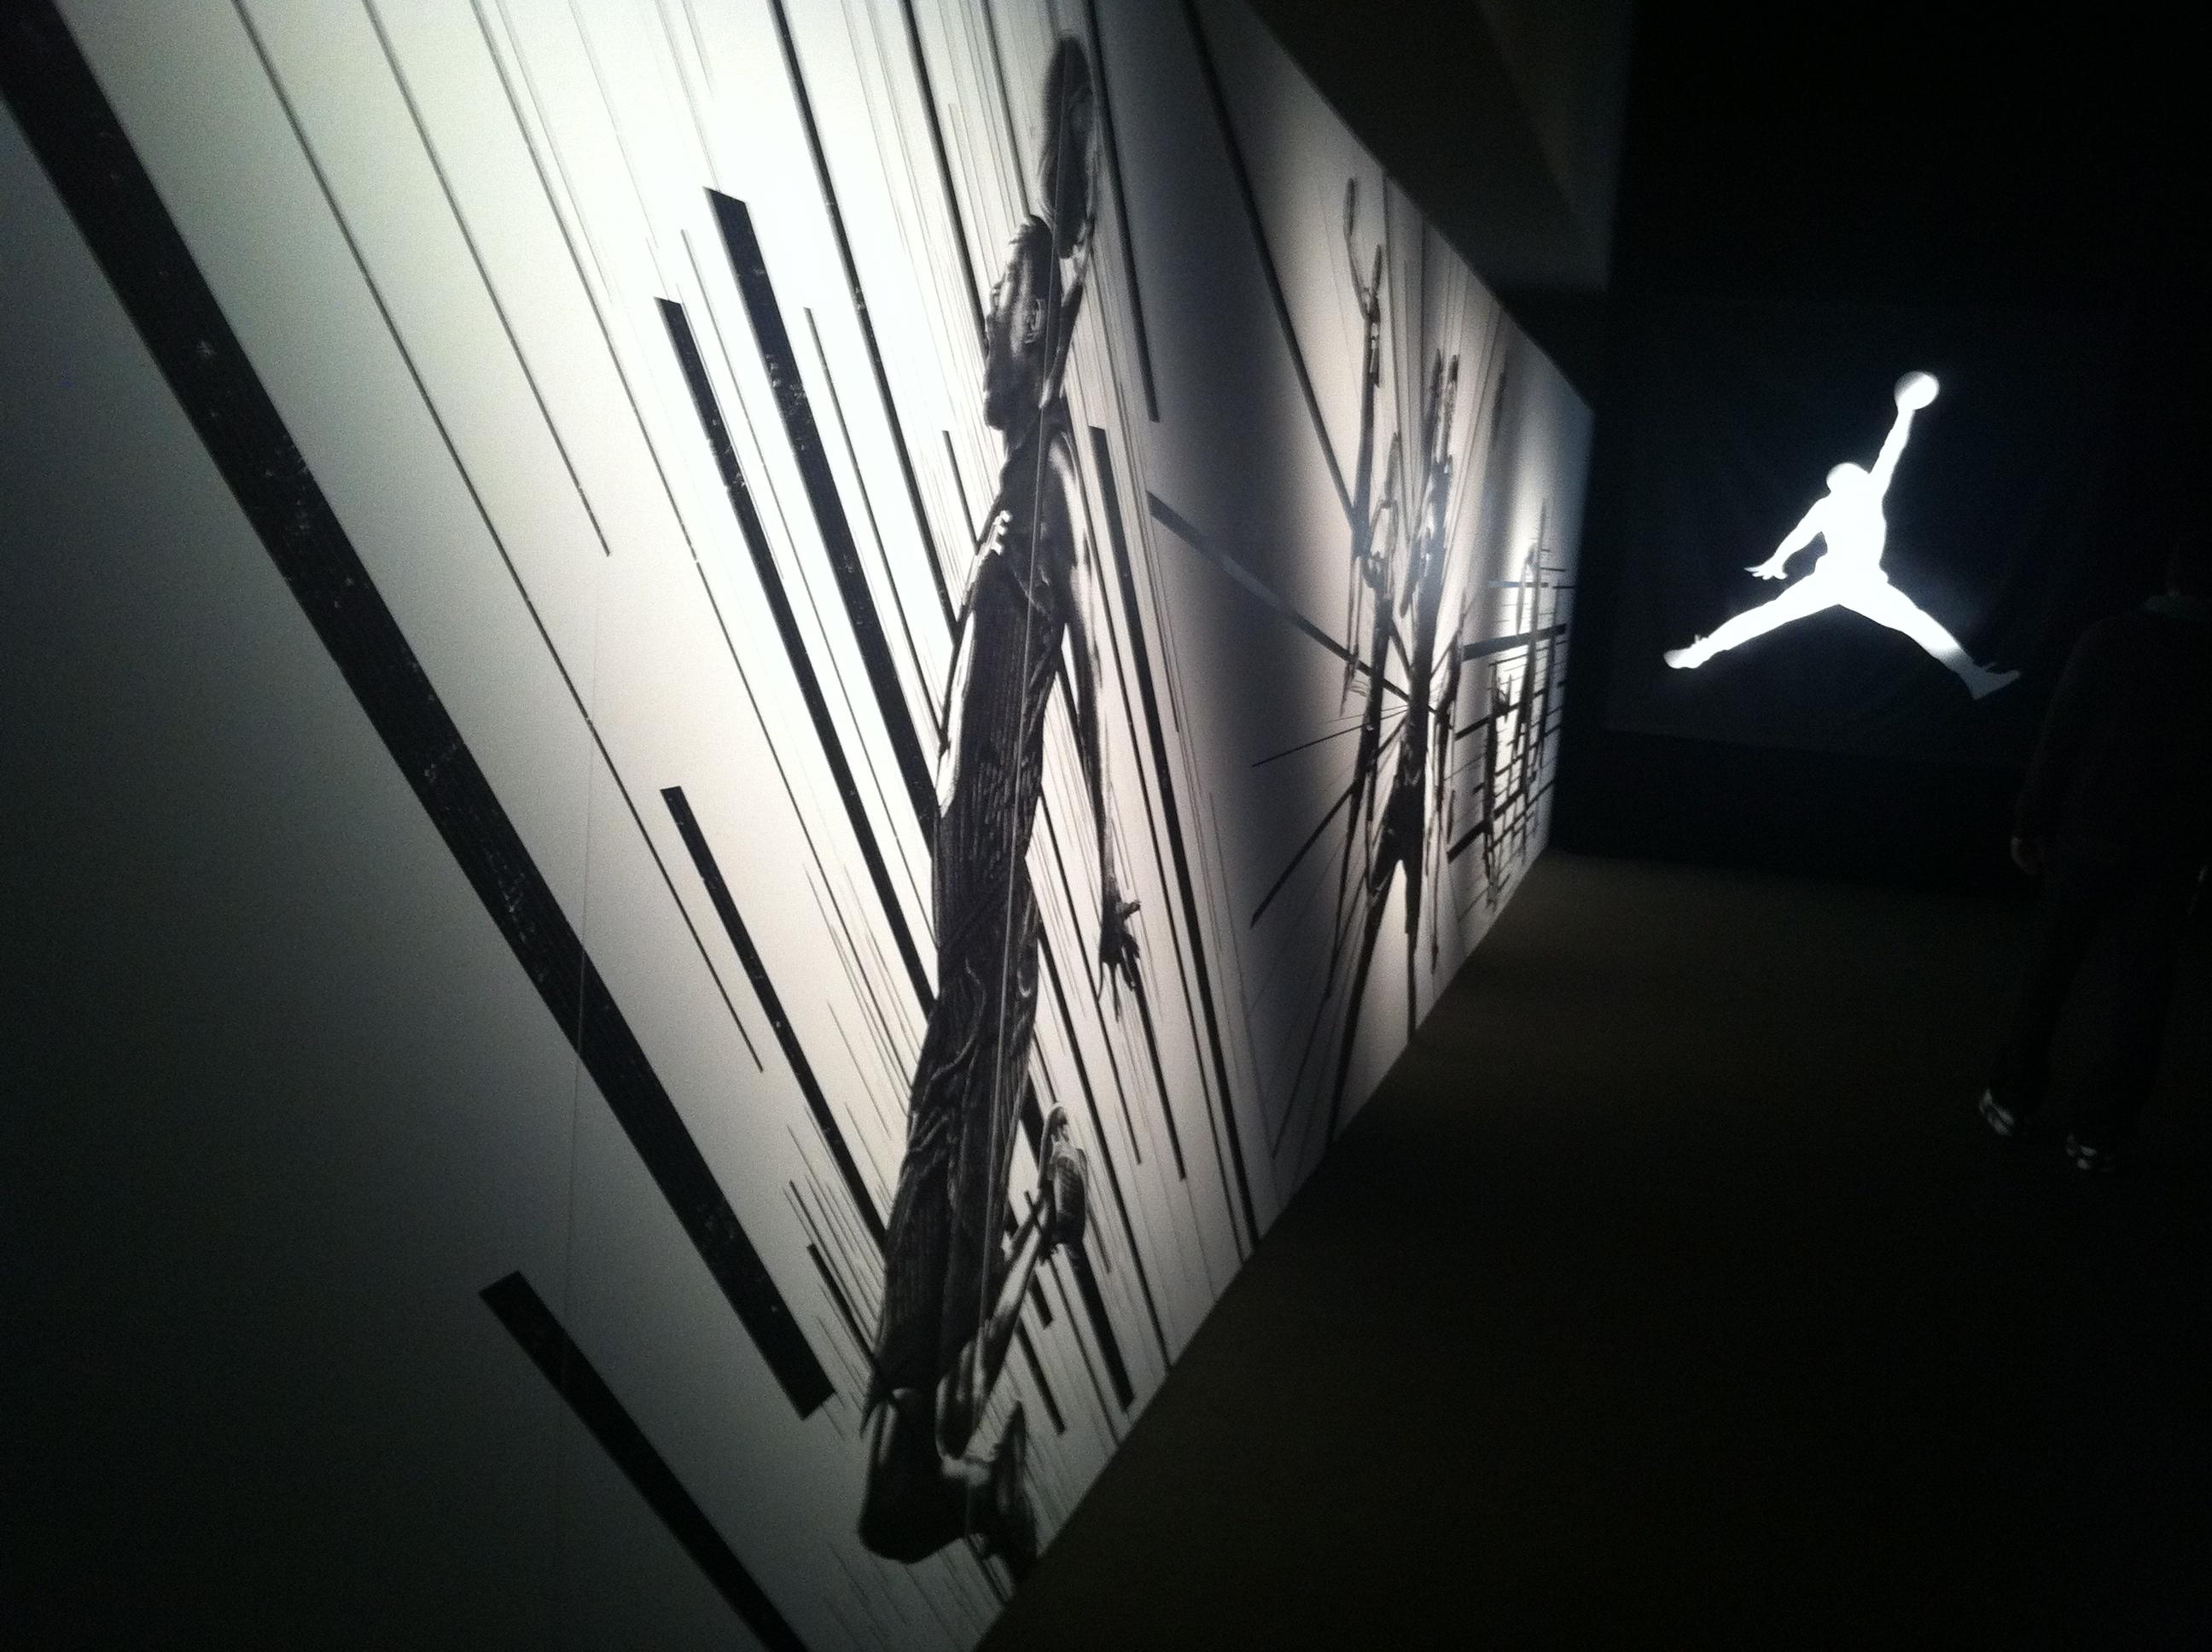 intro hallway - Jordan Flight Forum Holiday 2011